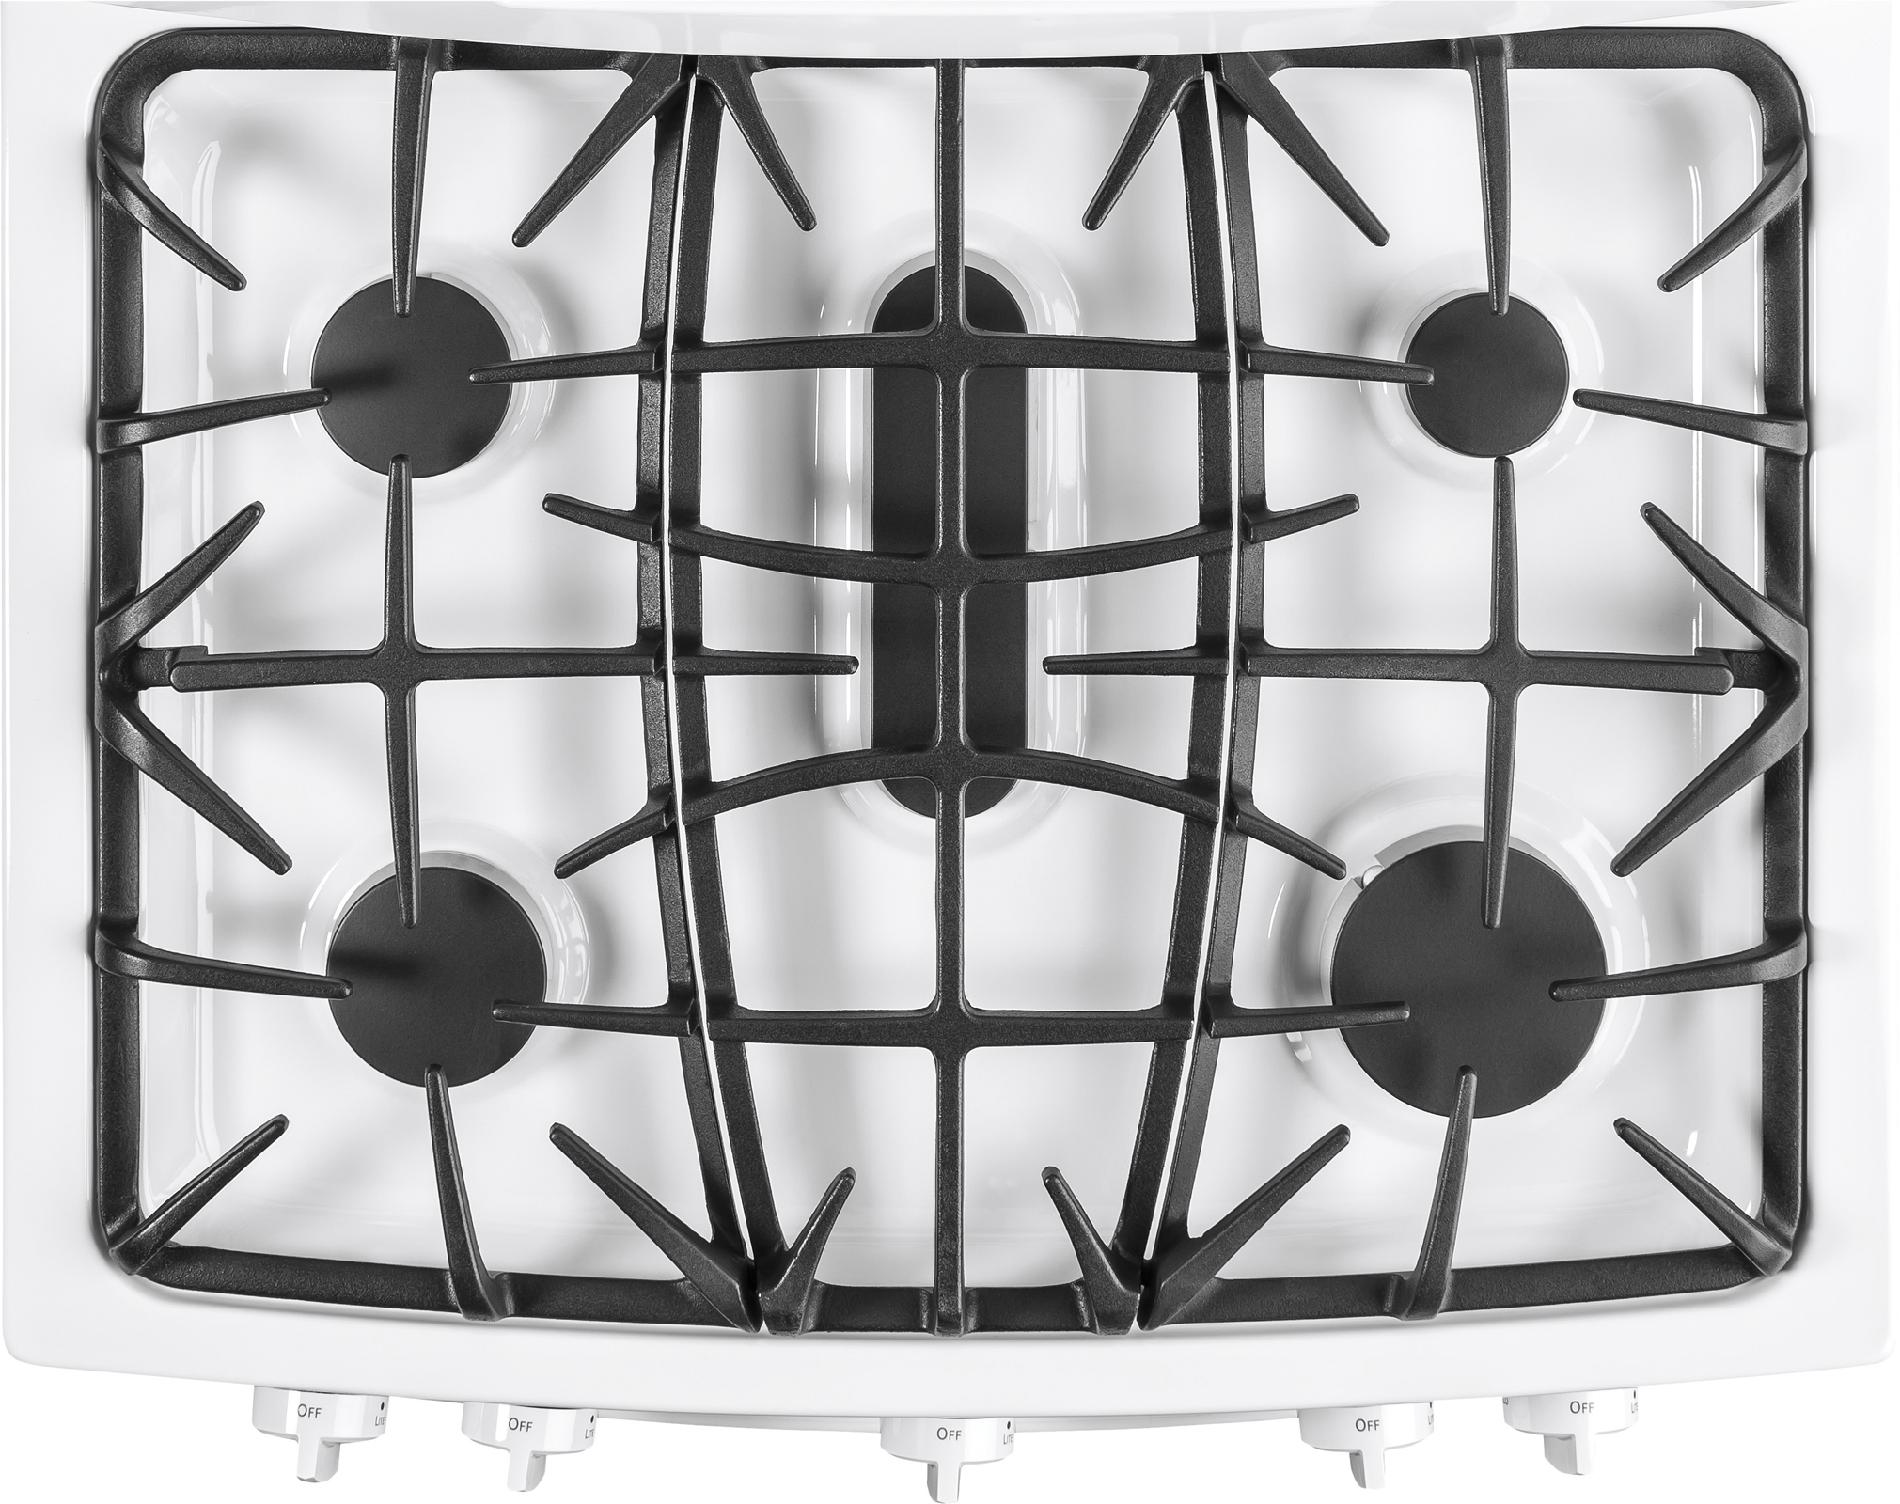 GE Appliances 6.8 cu. ft. Gas Range w/ Double Oven - White